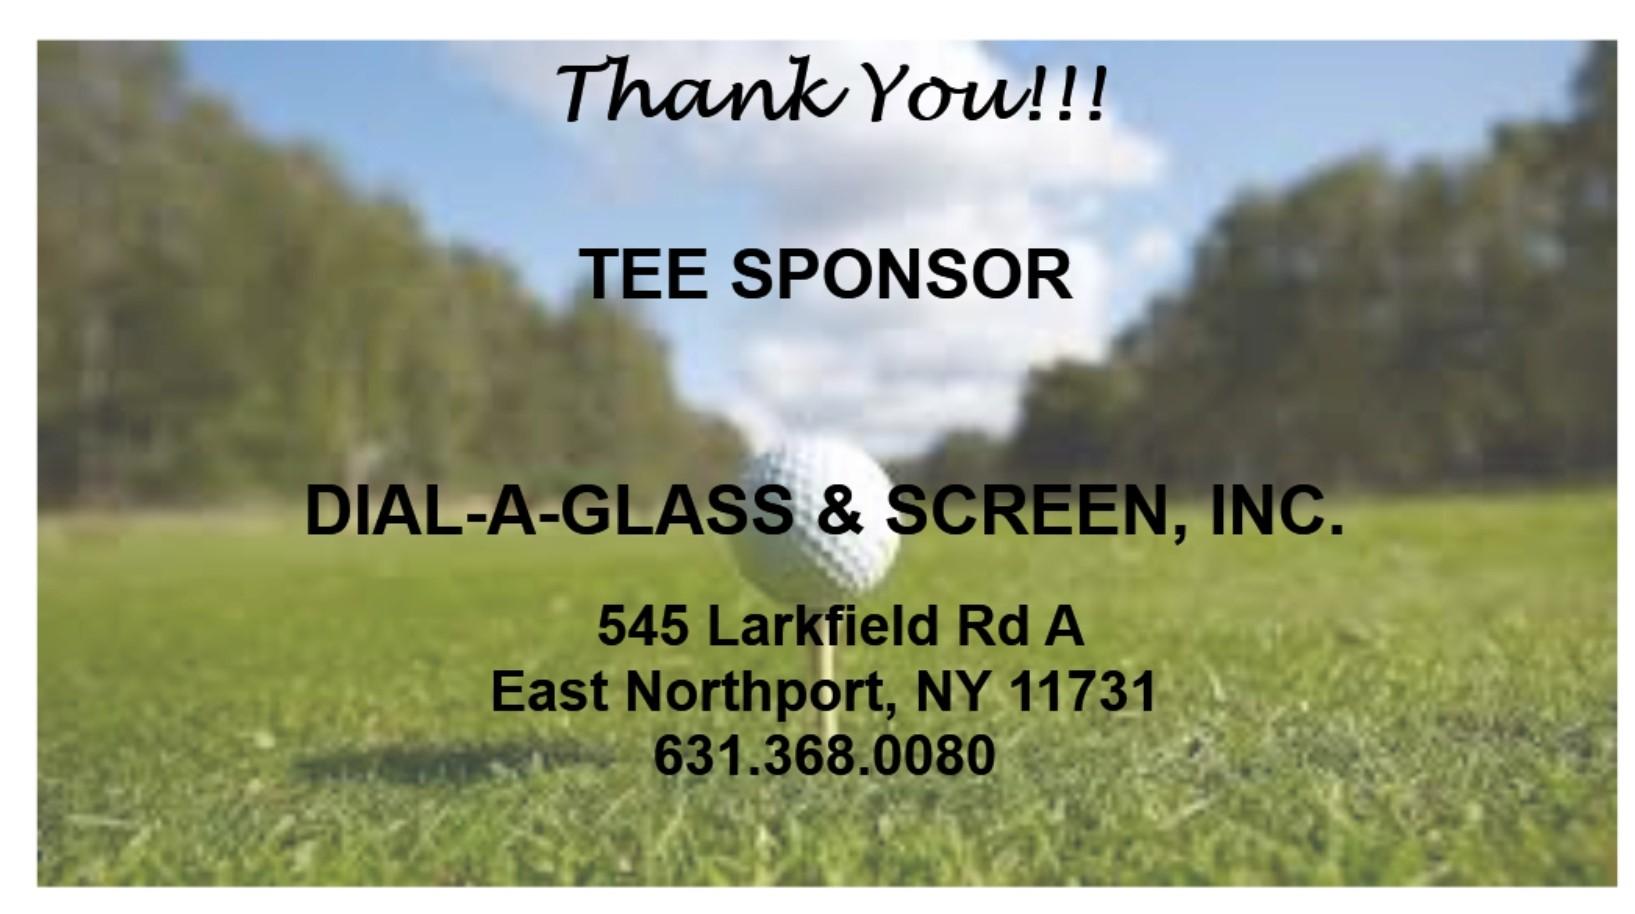 Dial-A-Glass & Screen, Inc.